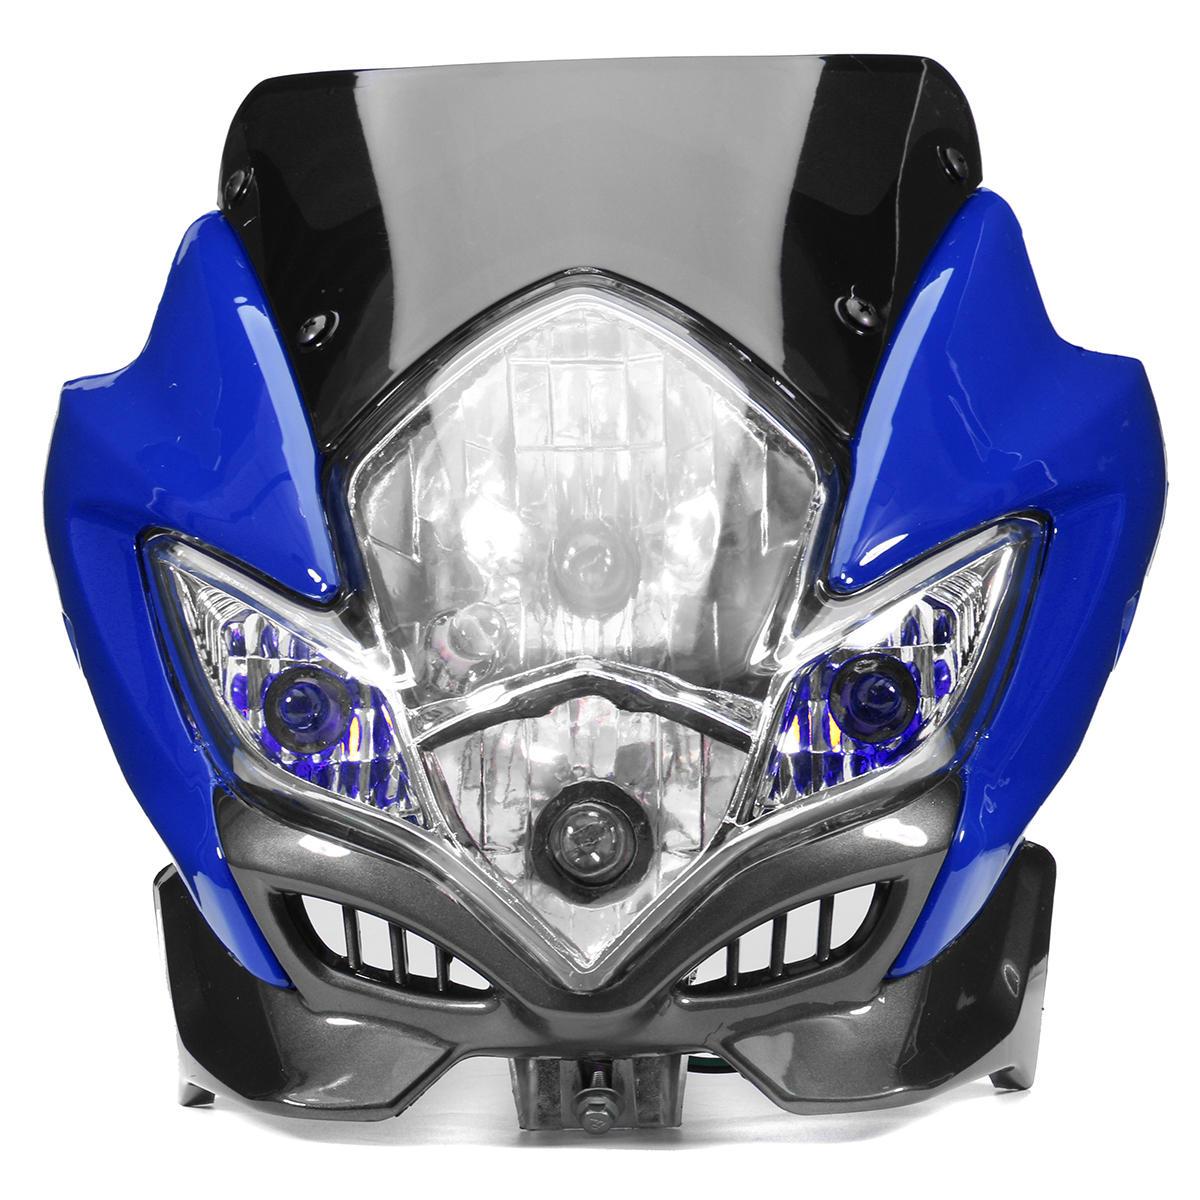 differently 5e94a a8f06 Universal Motorcycle Dirt Bike Street Fighter Headlight Lamp Bike Fairing  COD